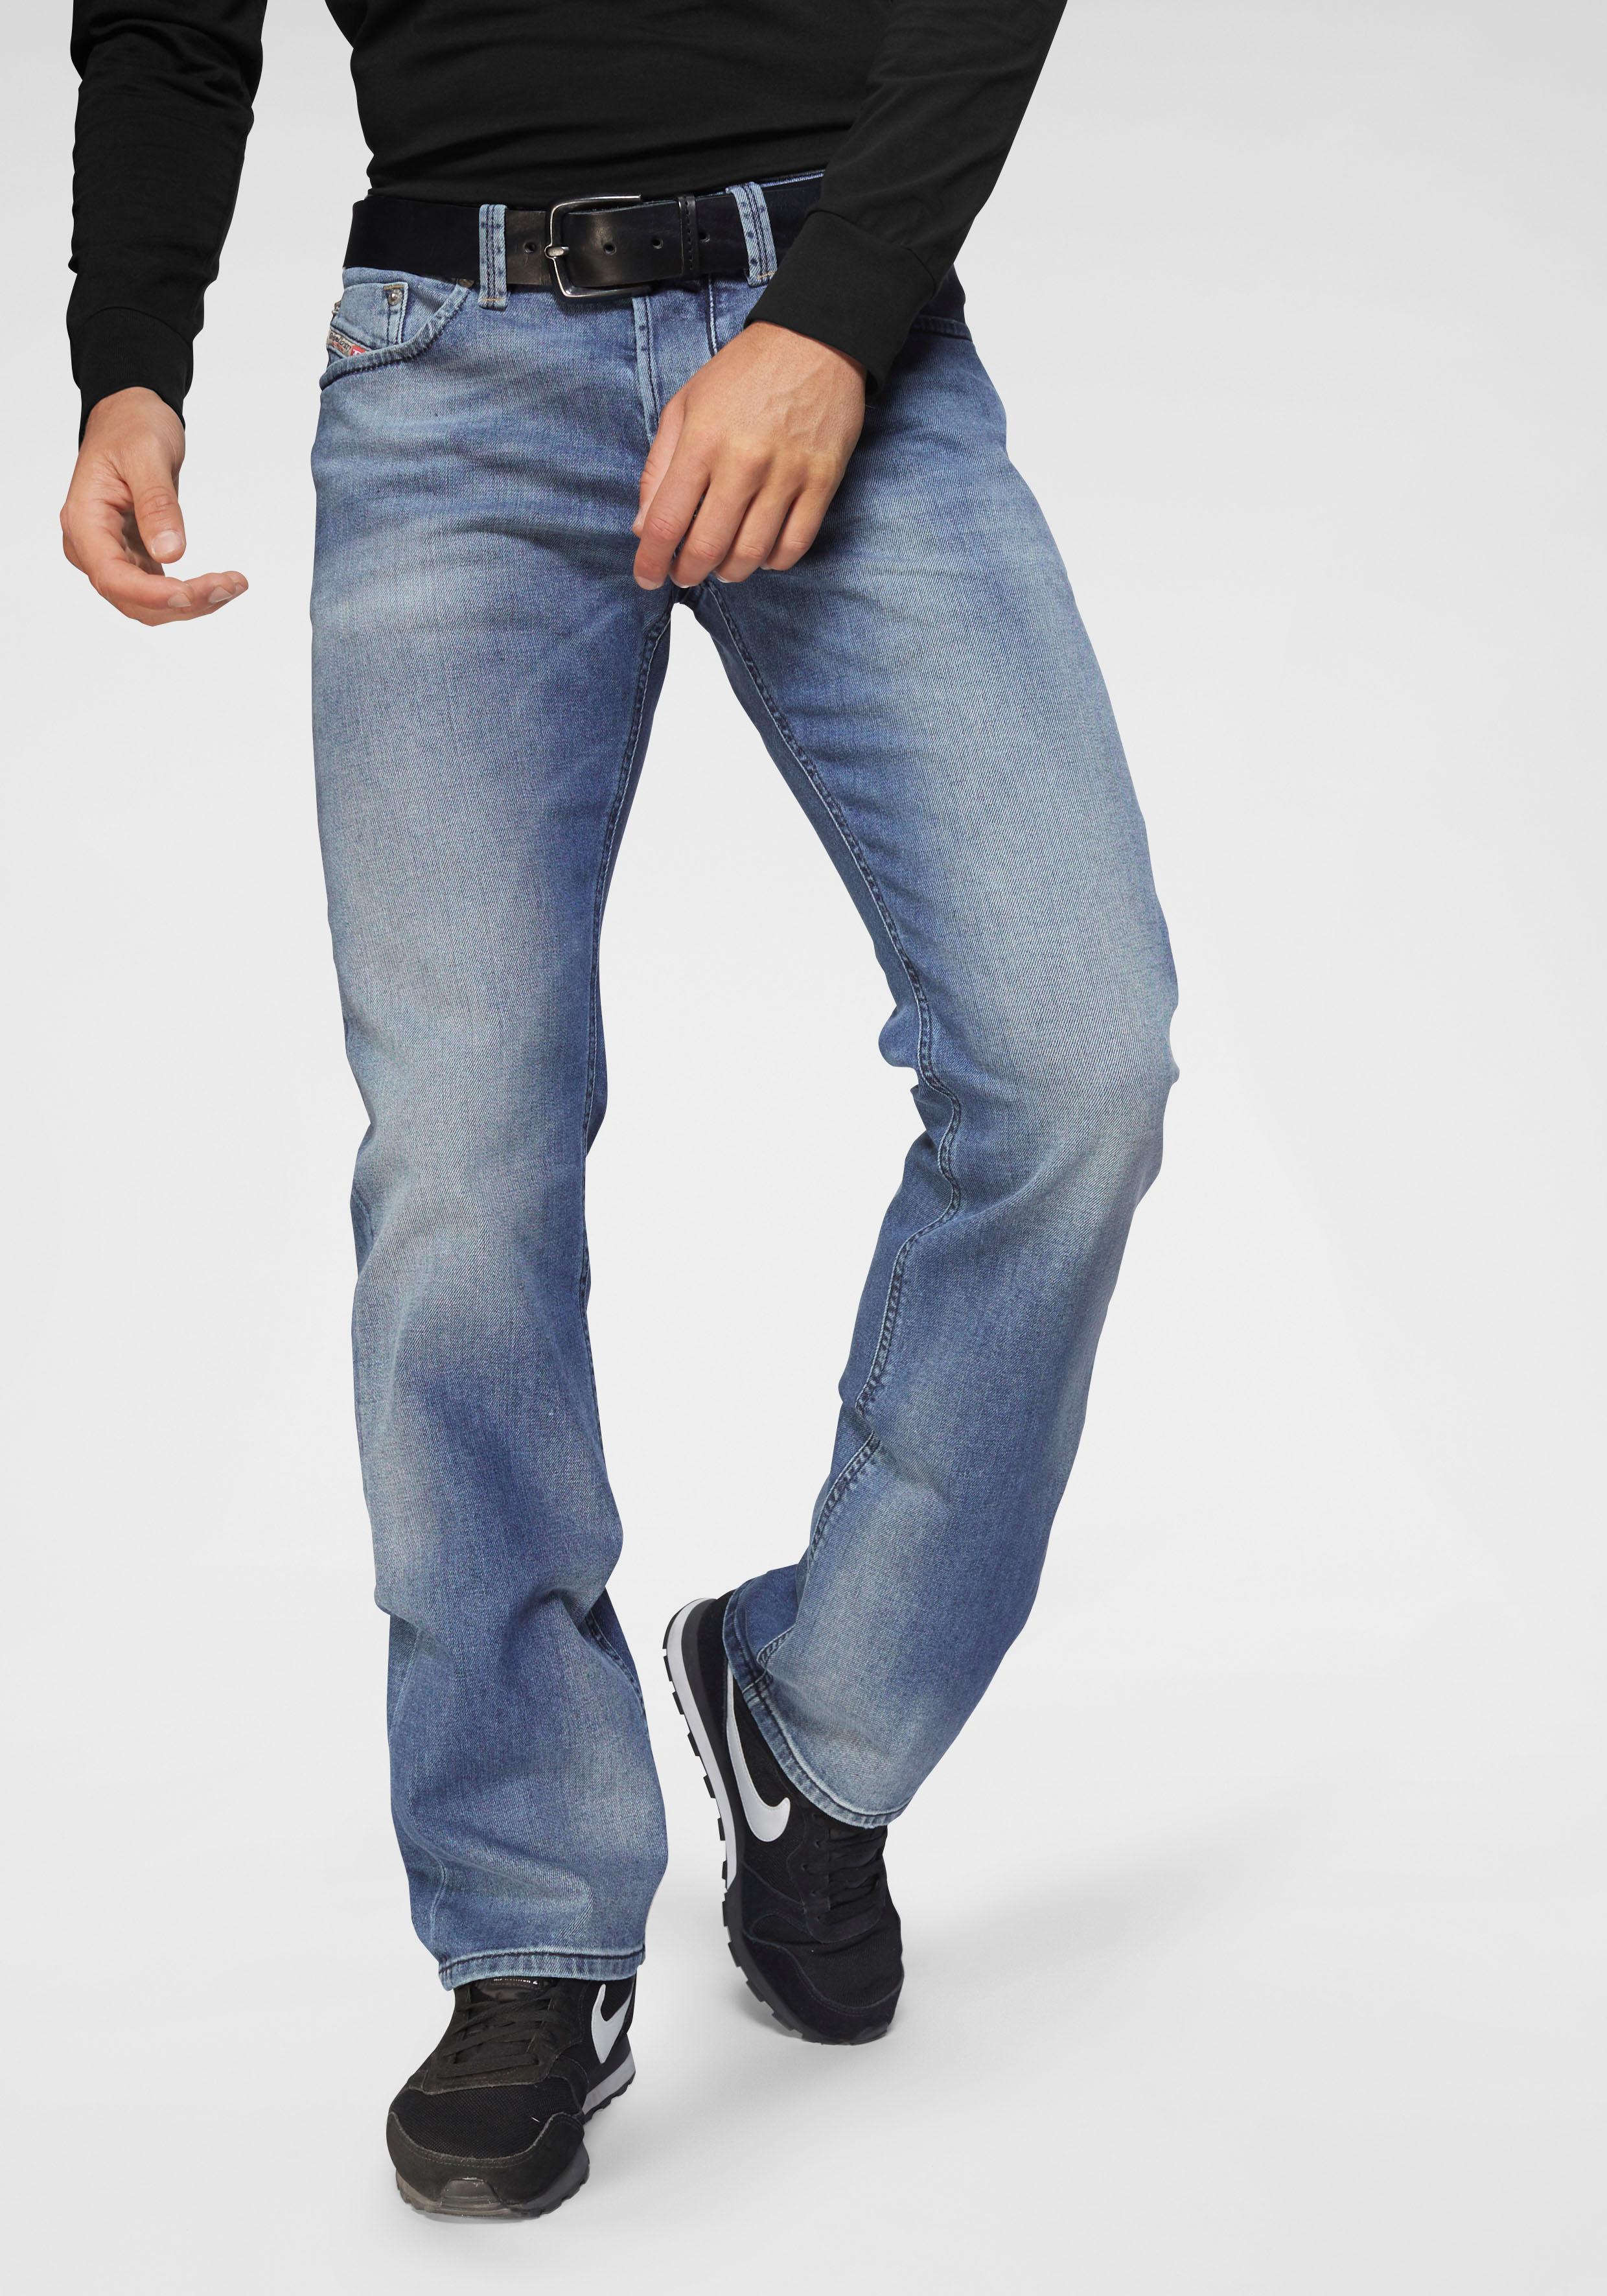 Diesel Straight-Jeans LARKEE | Bekleidung > Jeans > Straight Leg Jeans | Blau | Jeans | Diesel